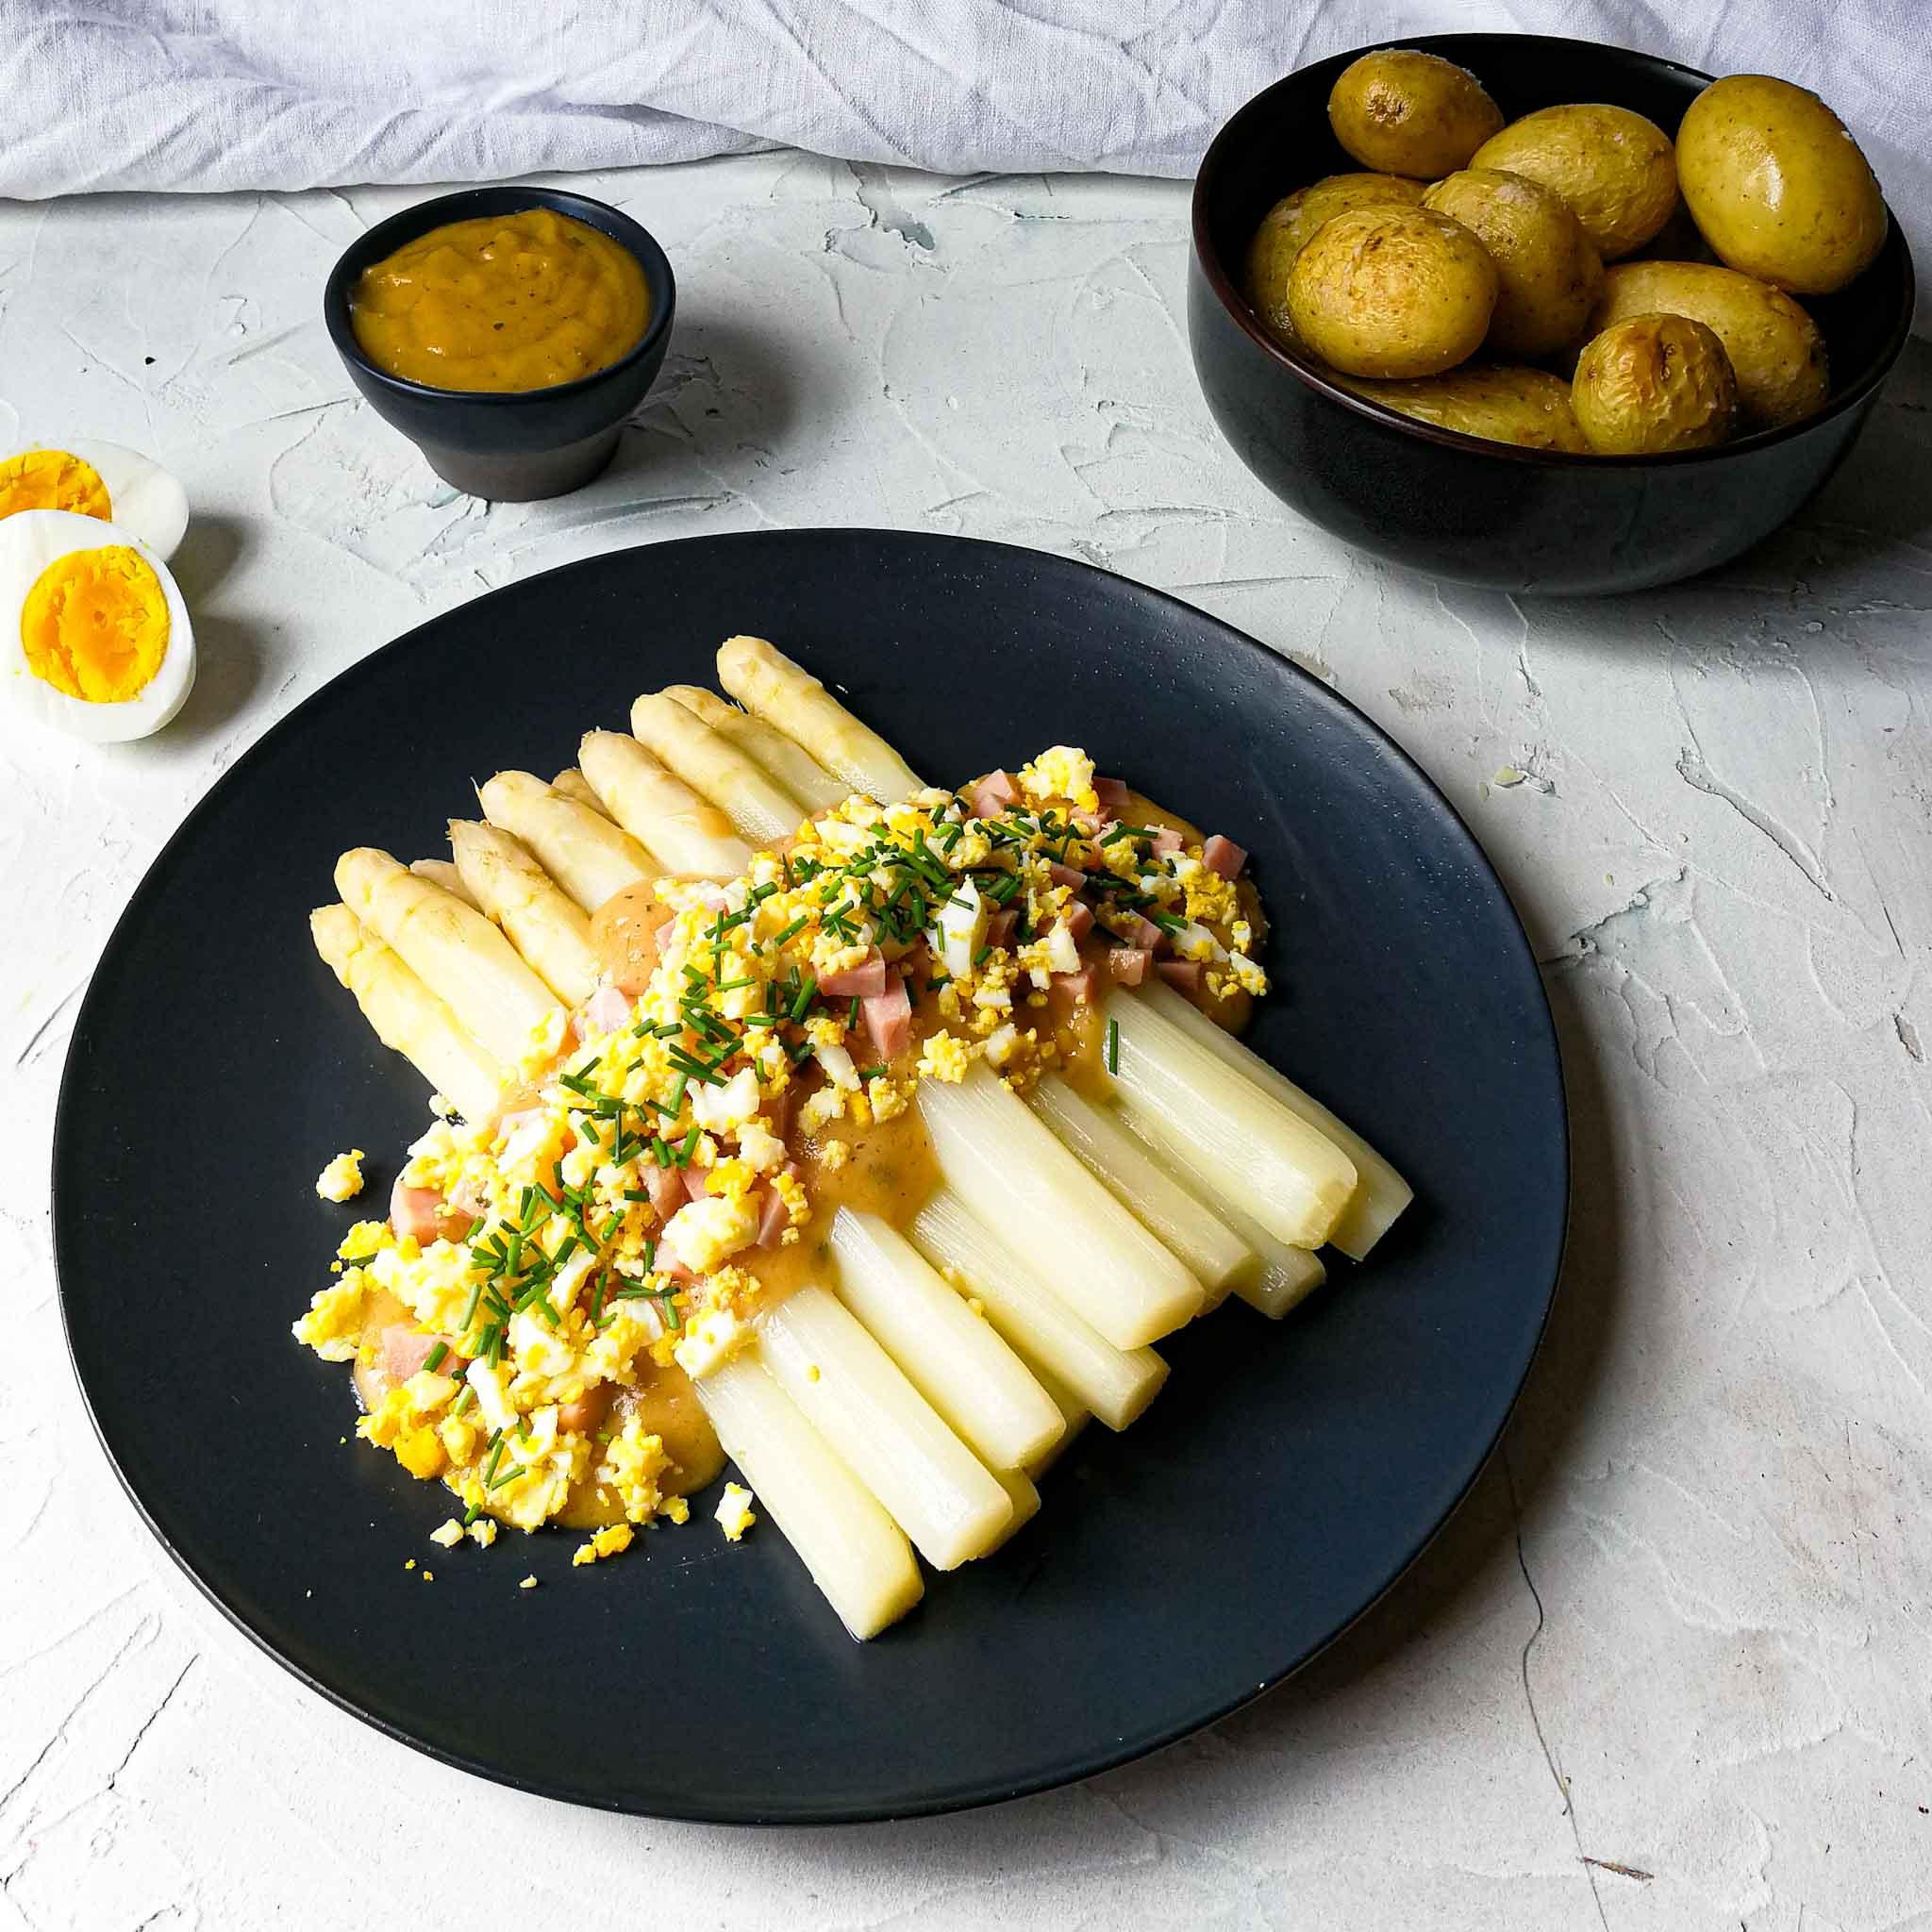 Asperges met ei, ham, botersaus en gepofte aardappel